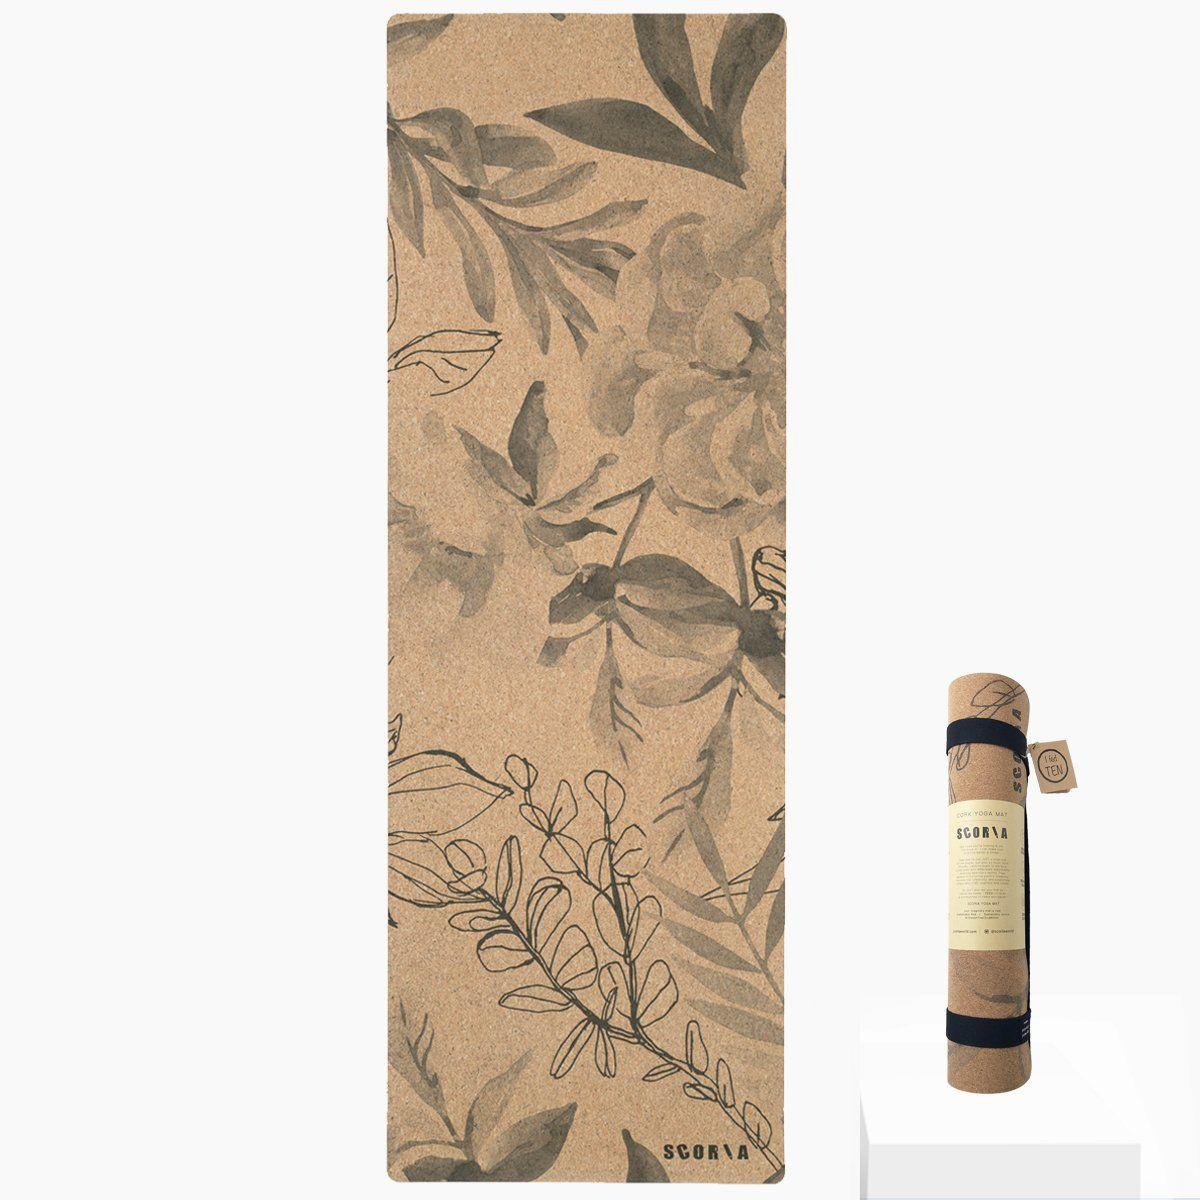 Blossom Cork Yoga Mat | 4.5MM | PRE-ORDER*